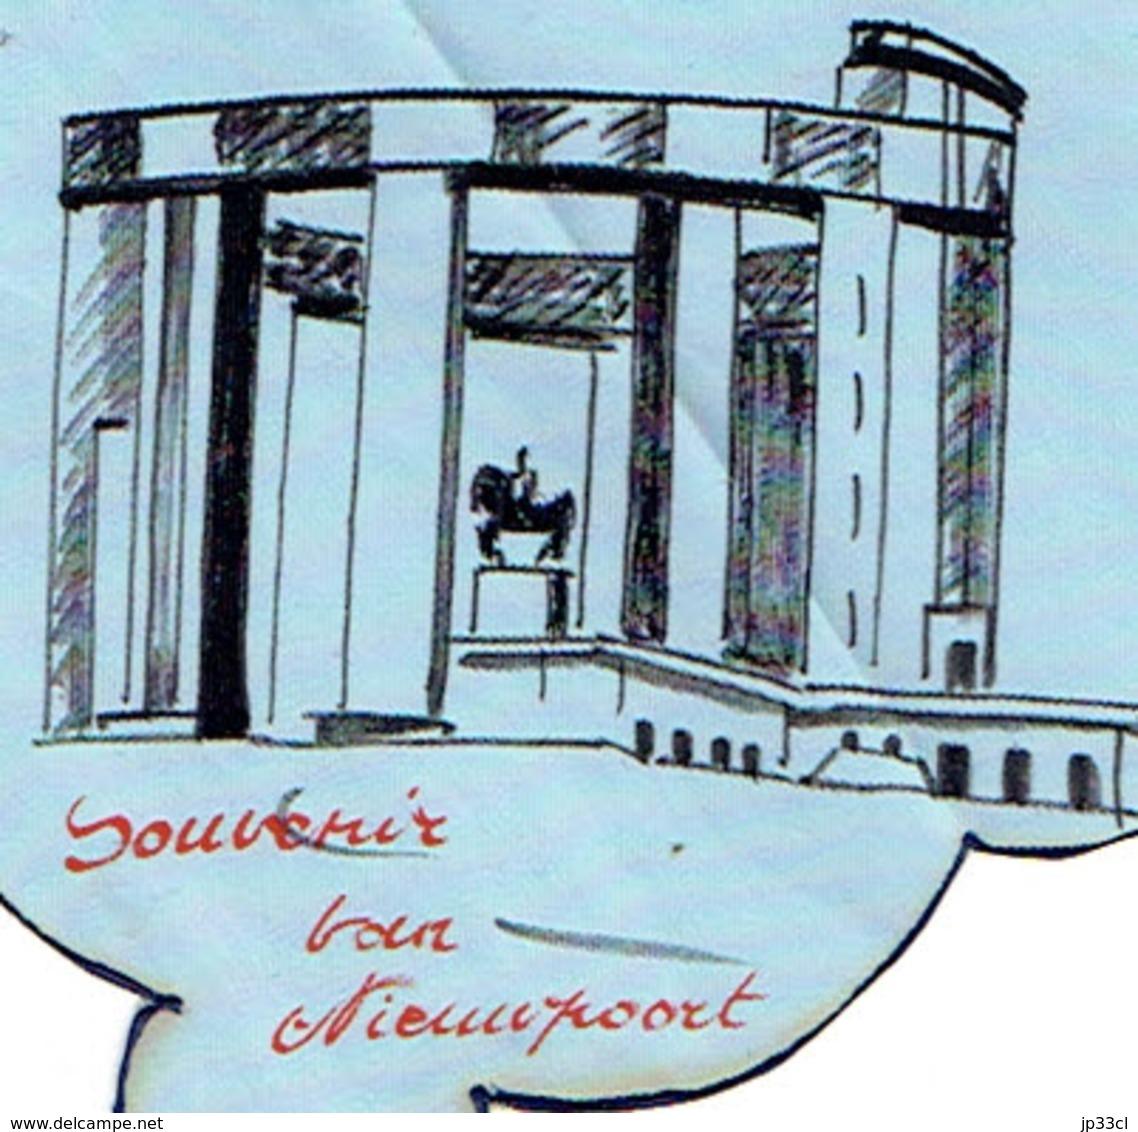 "Nieuport Koning Albert 1 Monument Roi Albert 1er Imprimé Sur Mouchoir (Zakdoek) ""Souvenir Van Nieuwpoort"" - Mouchoirs"